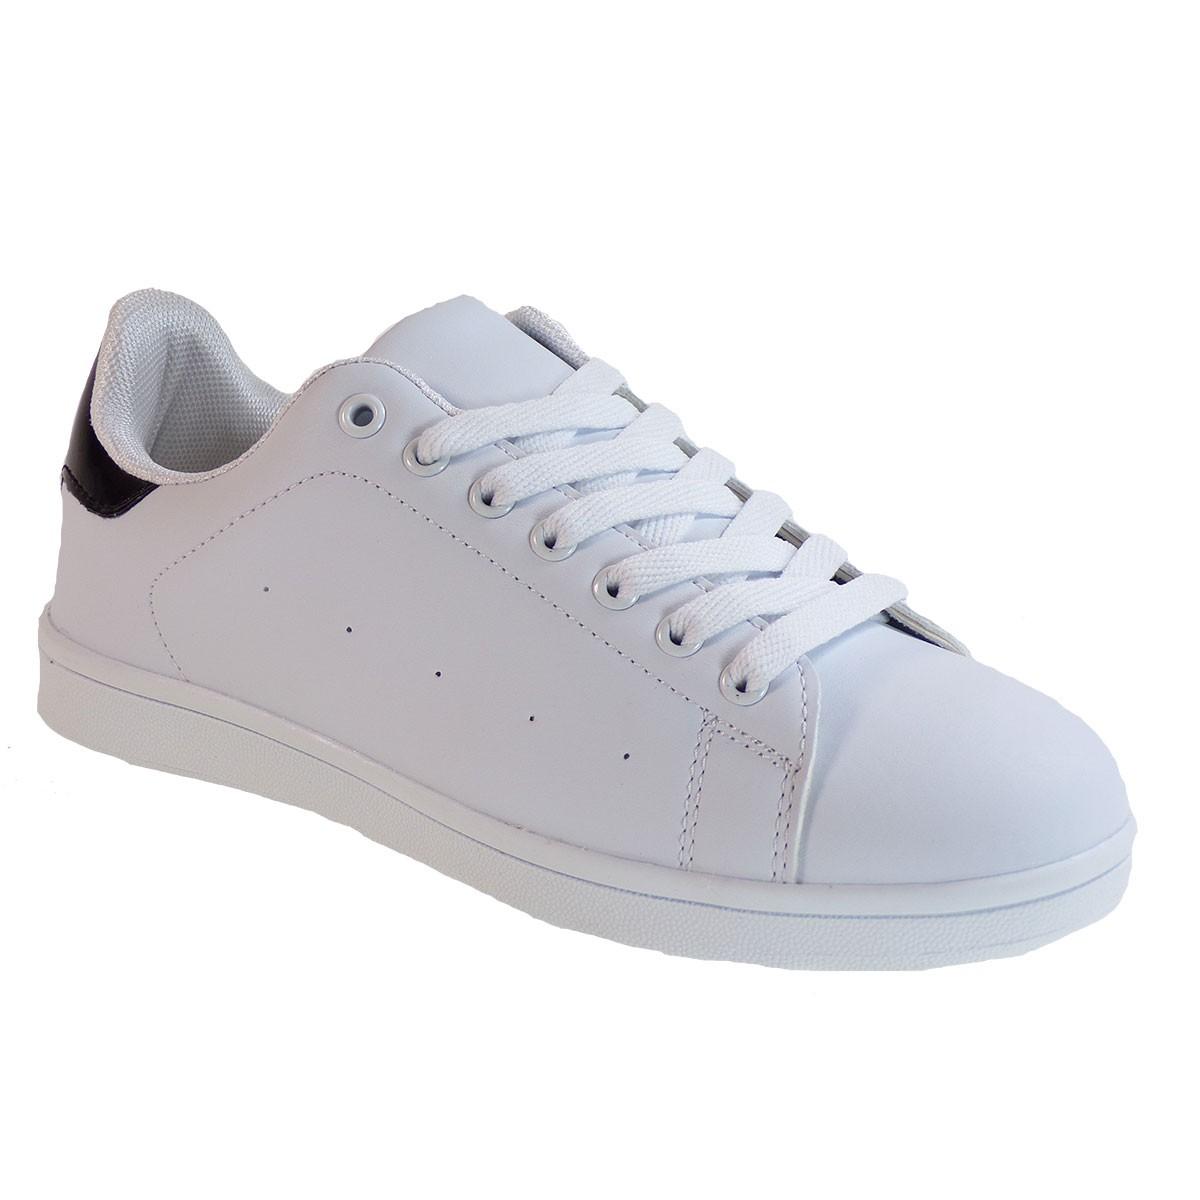 Bagiota Shoes Γυναικεία Παπούτσια Sneakers Αθλητικά Β801-8 Λευκό-Μαύρο